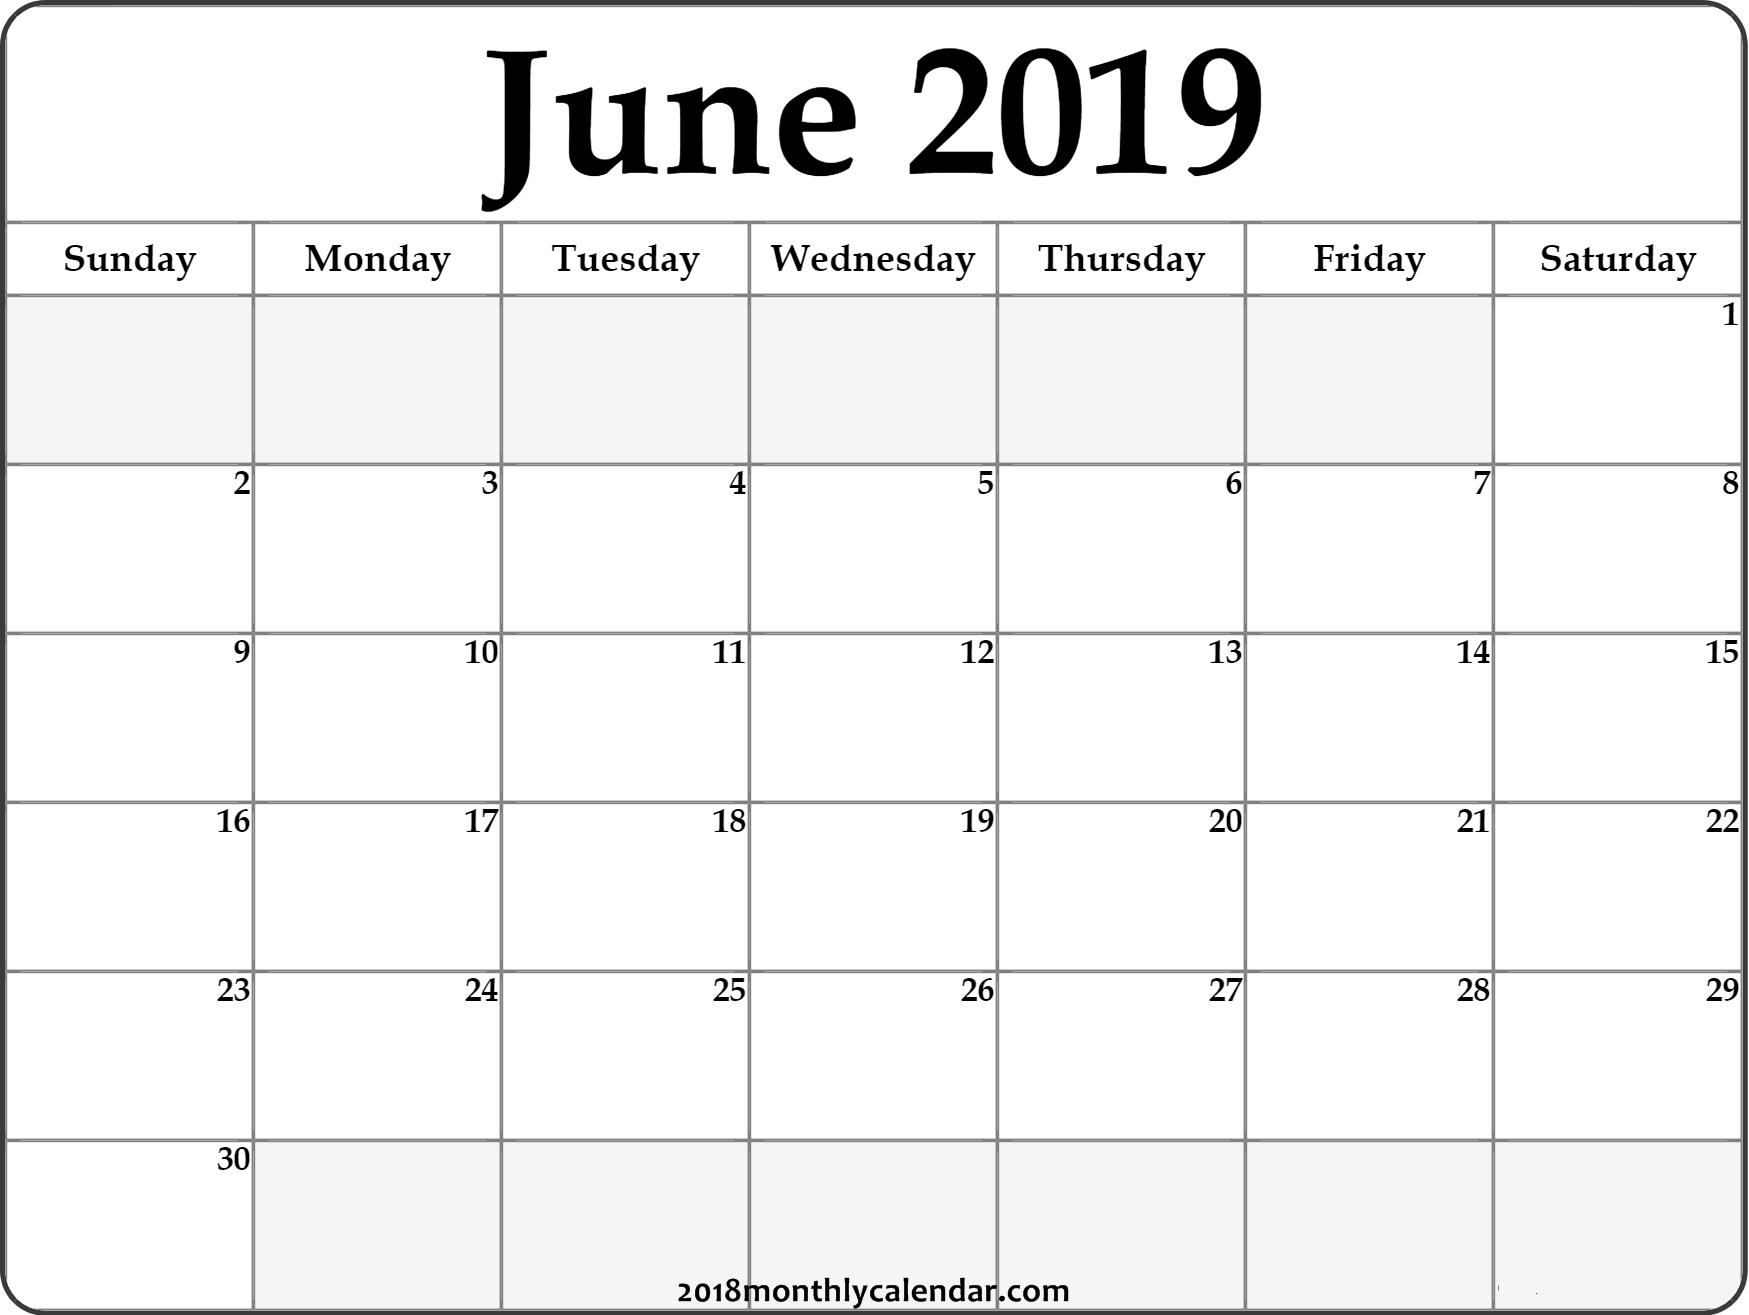 June Calendar 2019 #june #2019Calendar #june2019 #junecalendar Calendar Of 2019 June